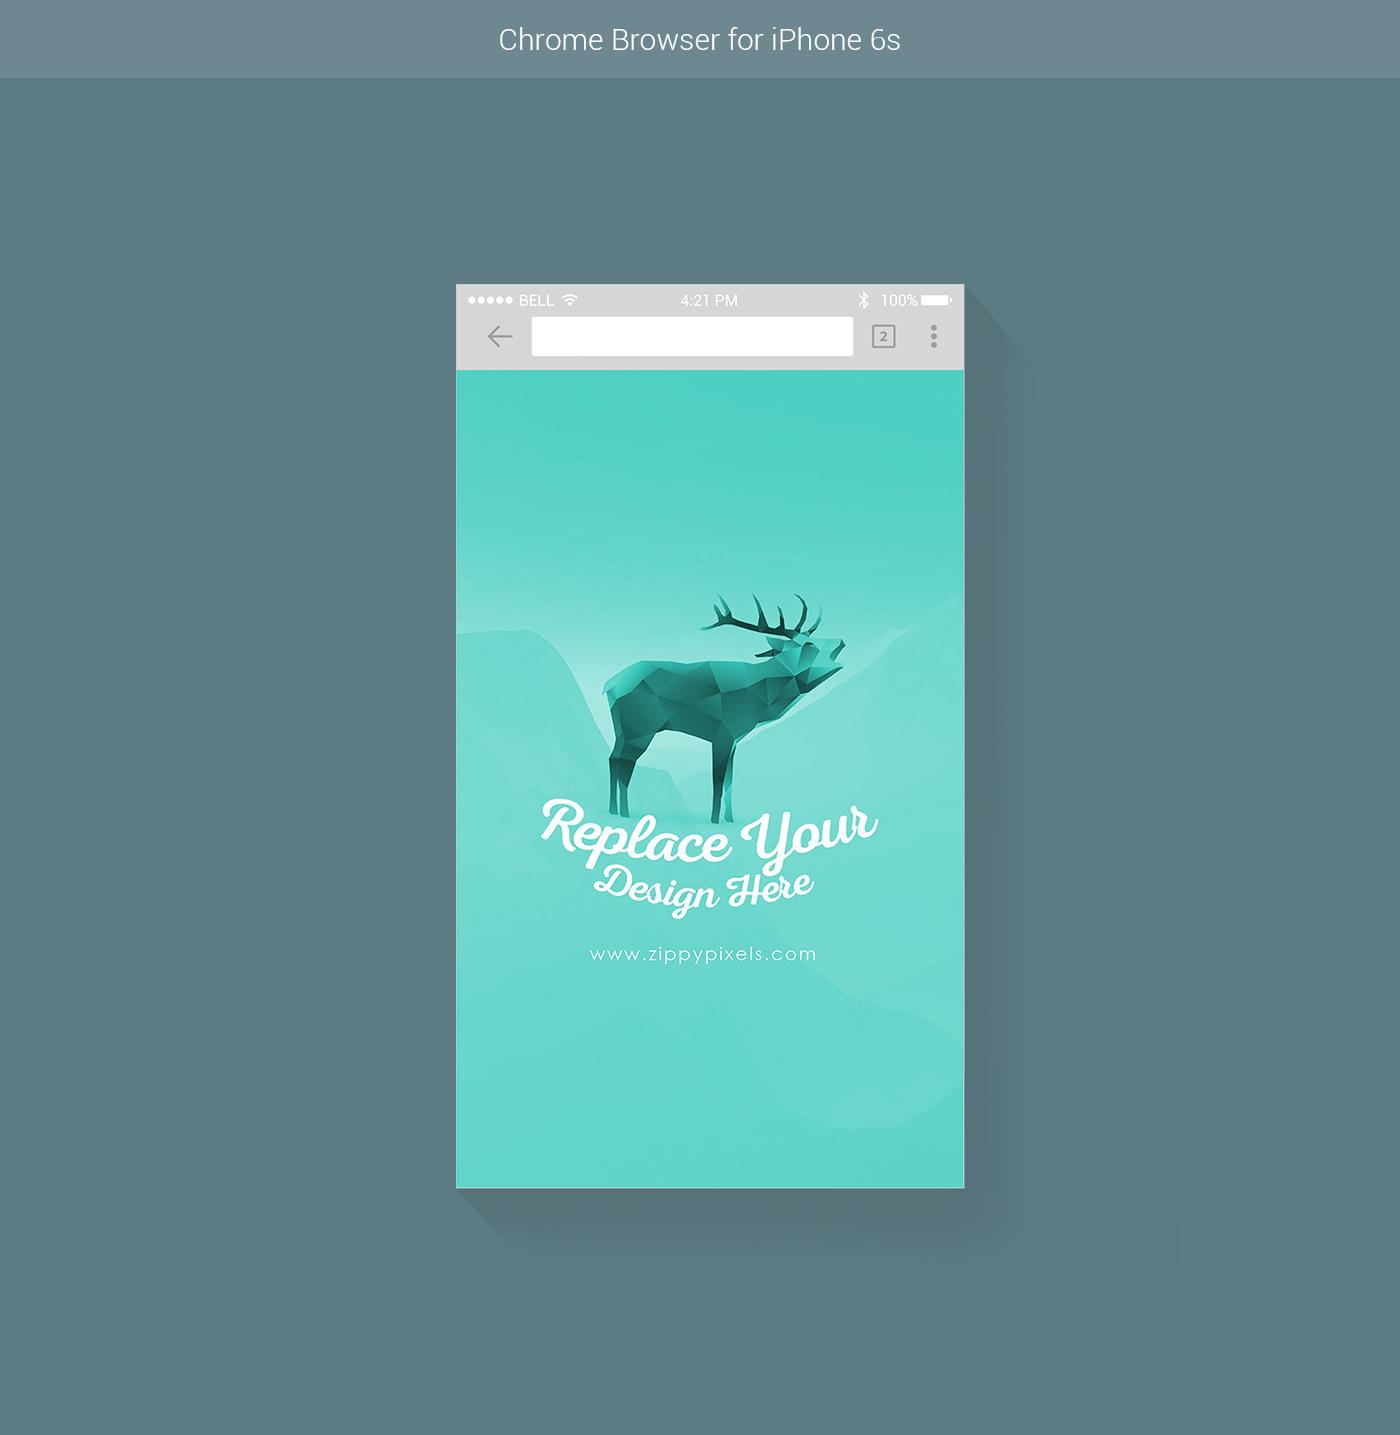 7 Free Vector Web & Mobile Browser Mockups on Behance